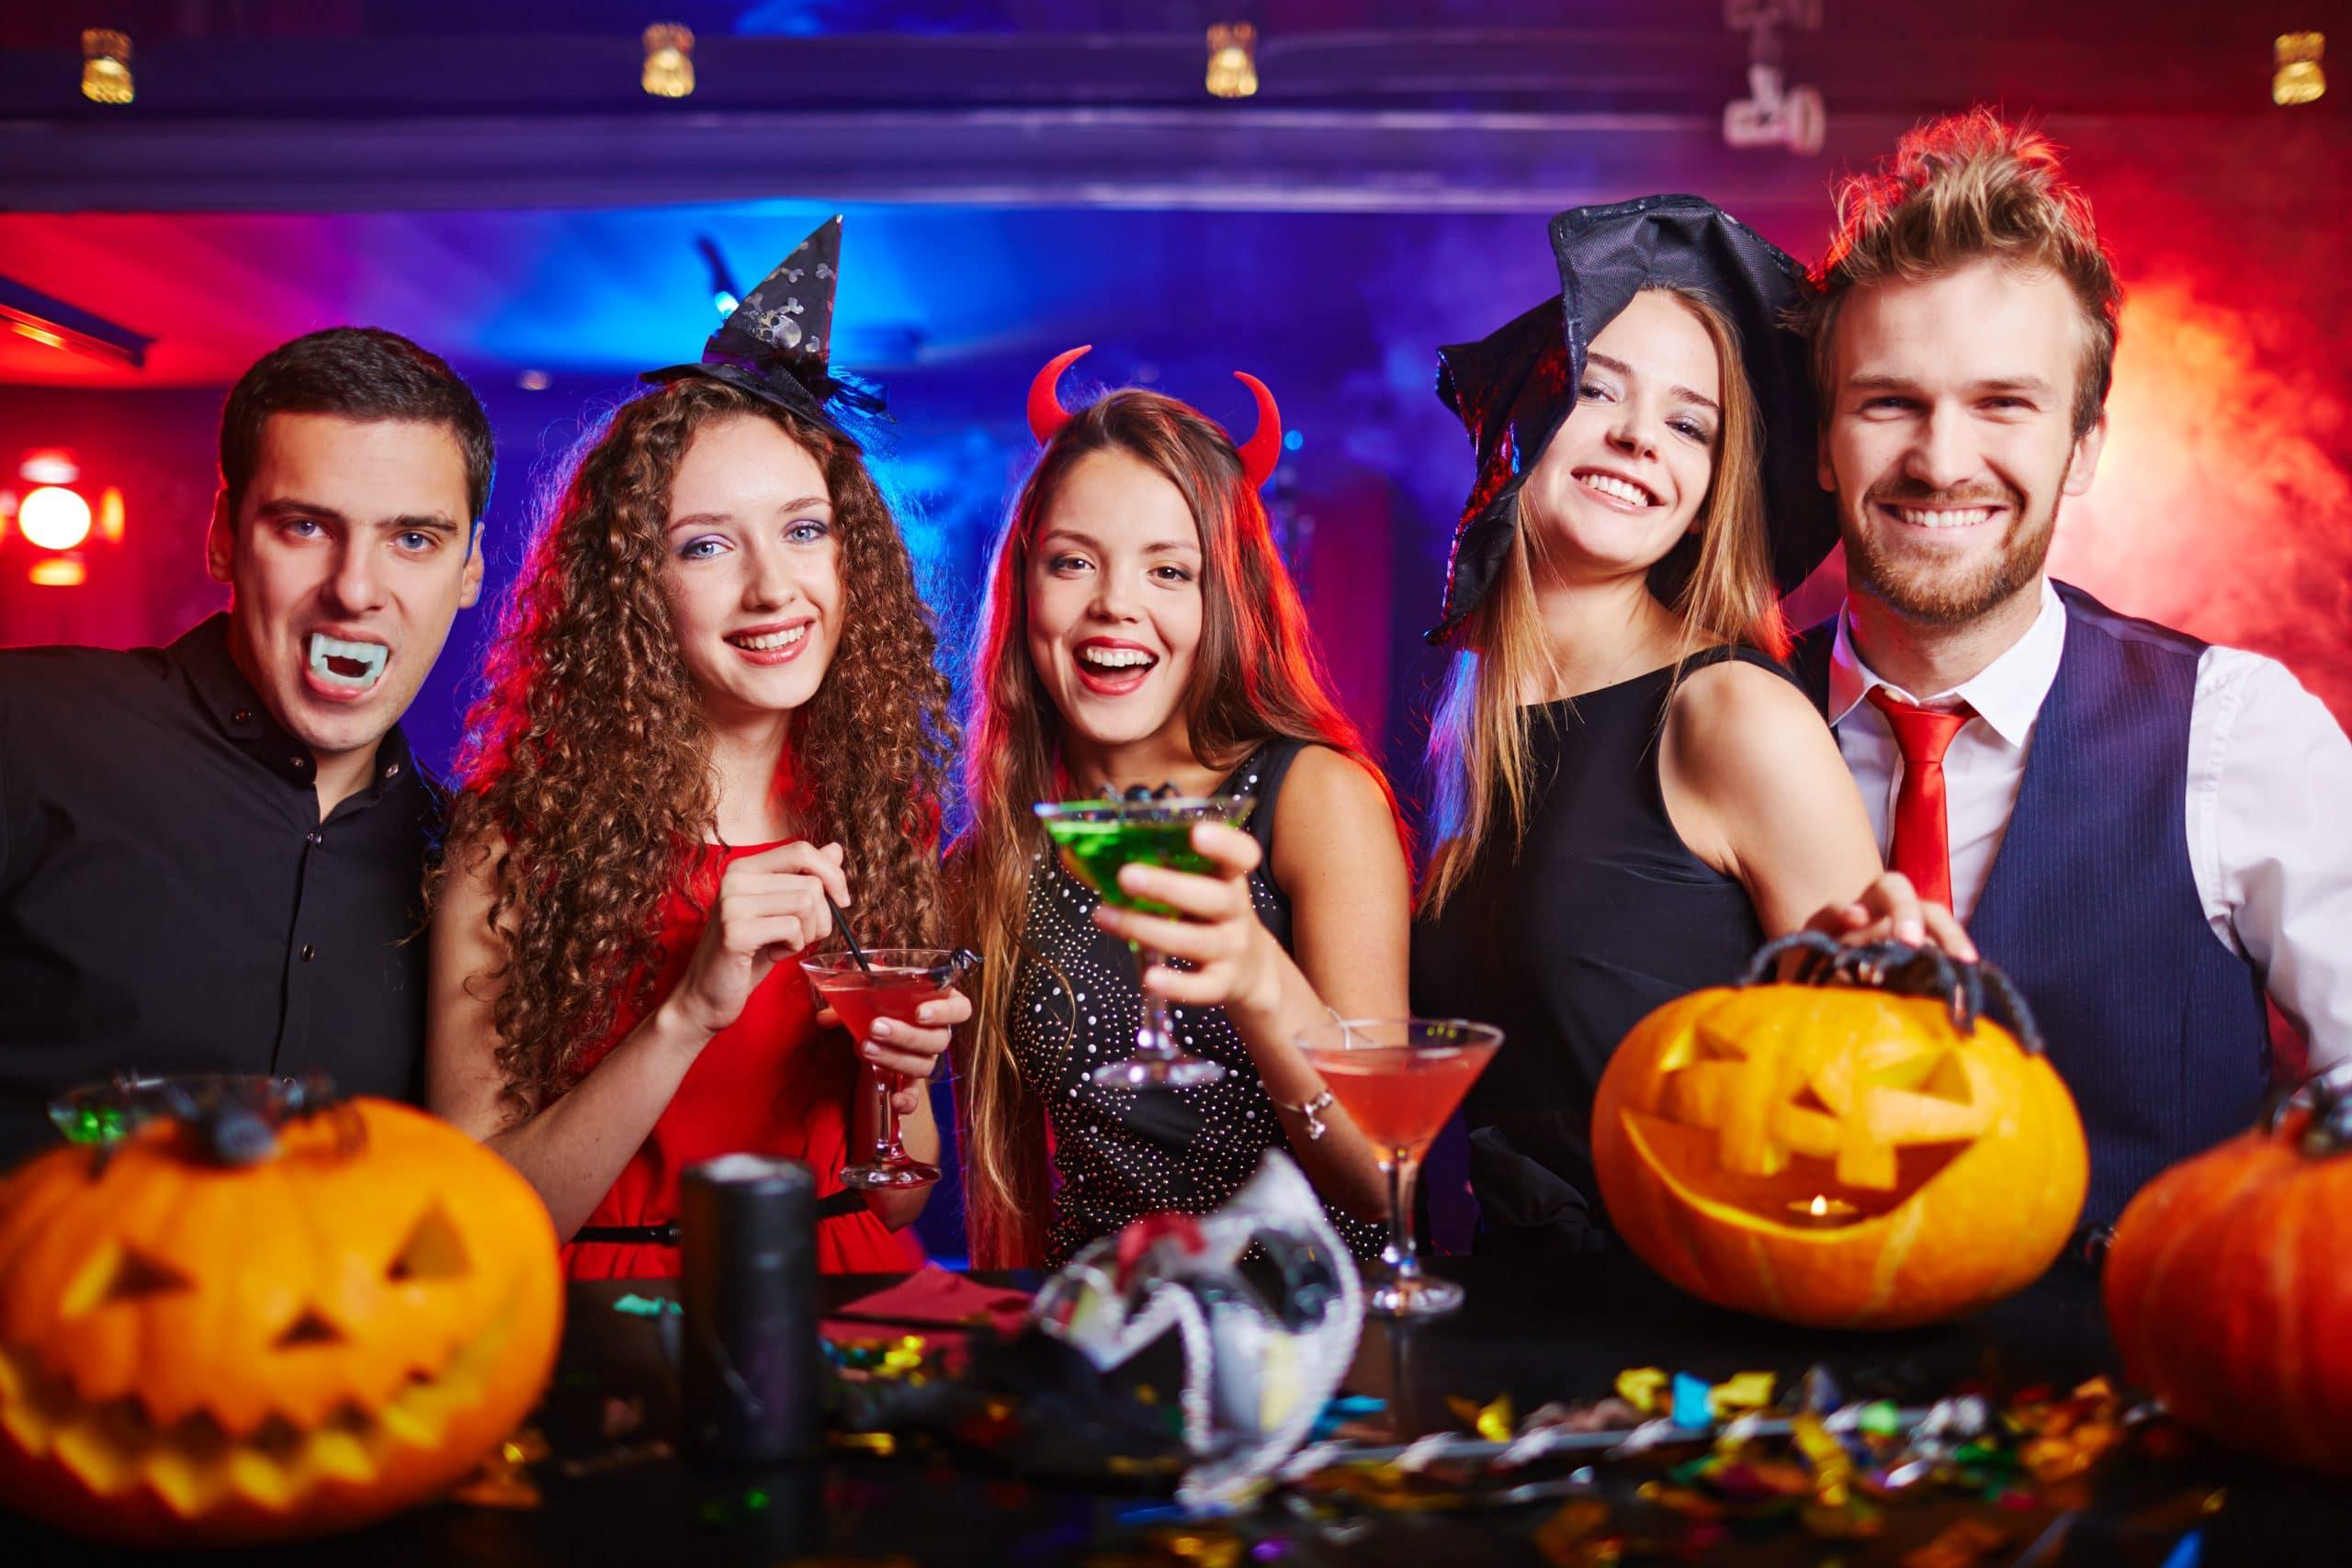 Halloween at nightclub